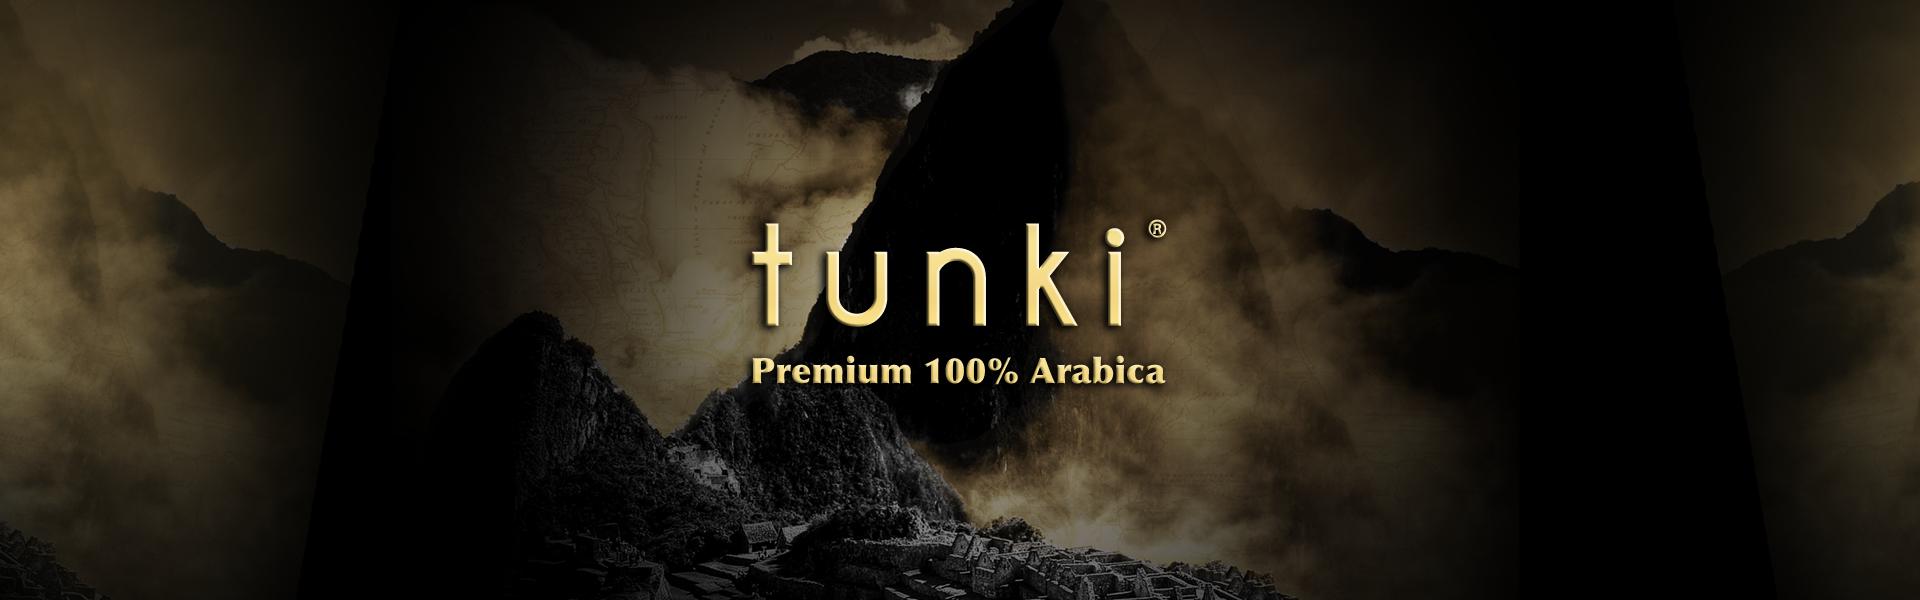 rijo42 | Tunki Official Supplier